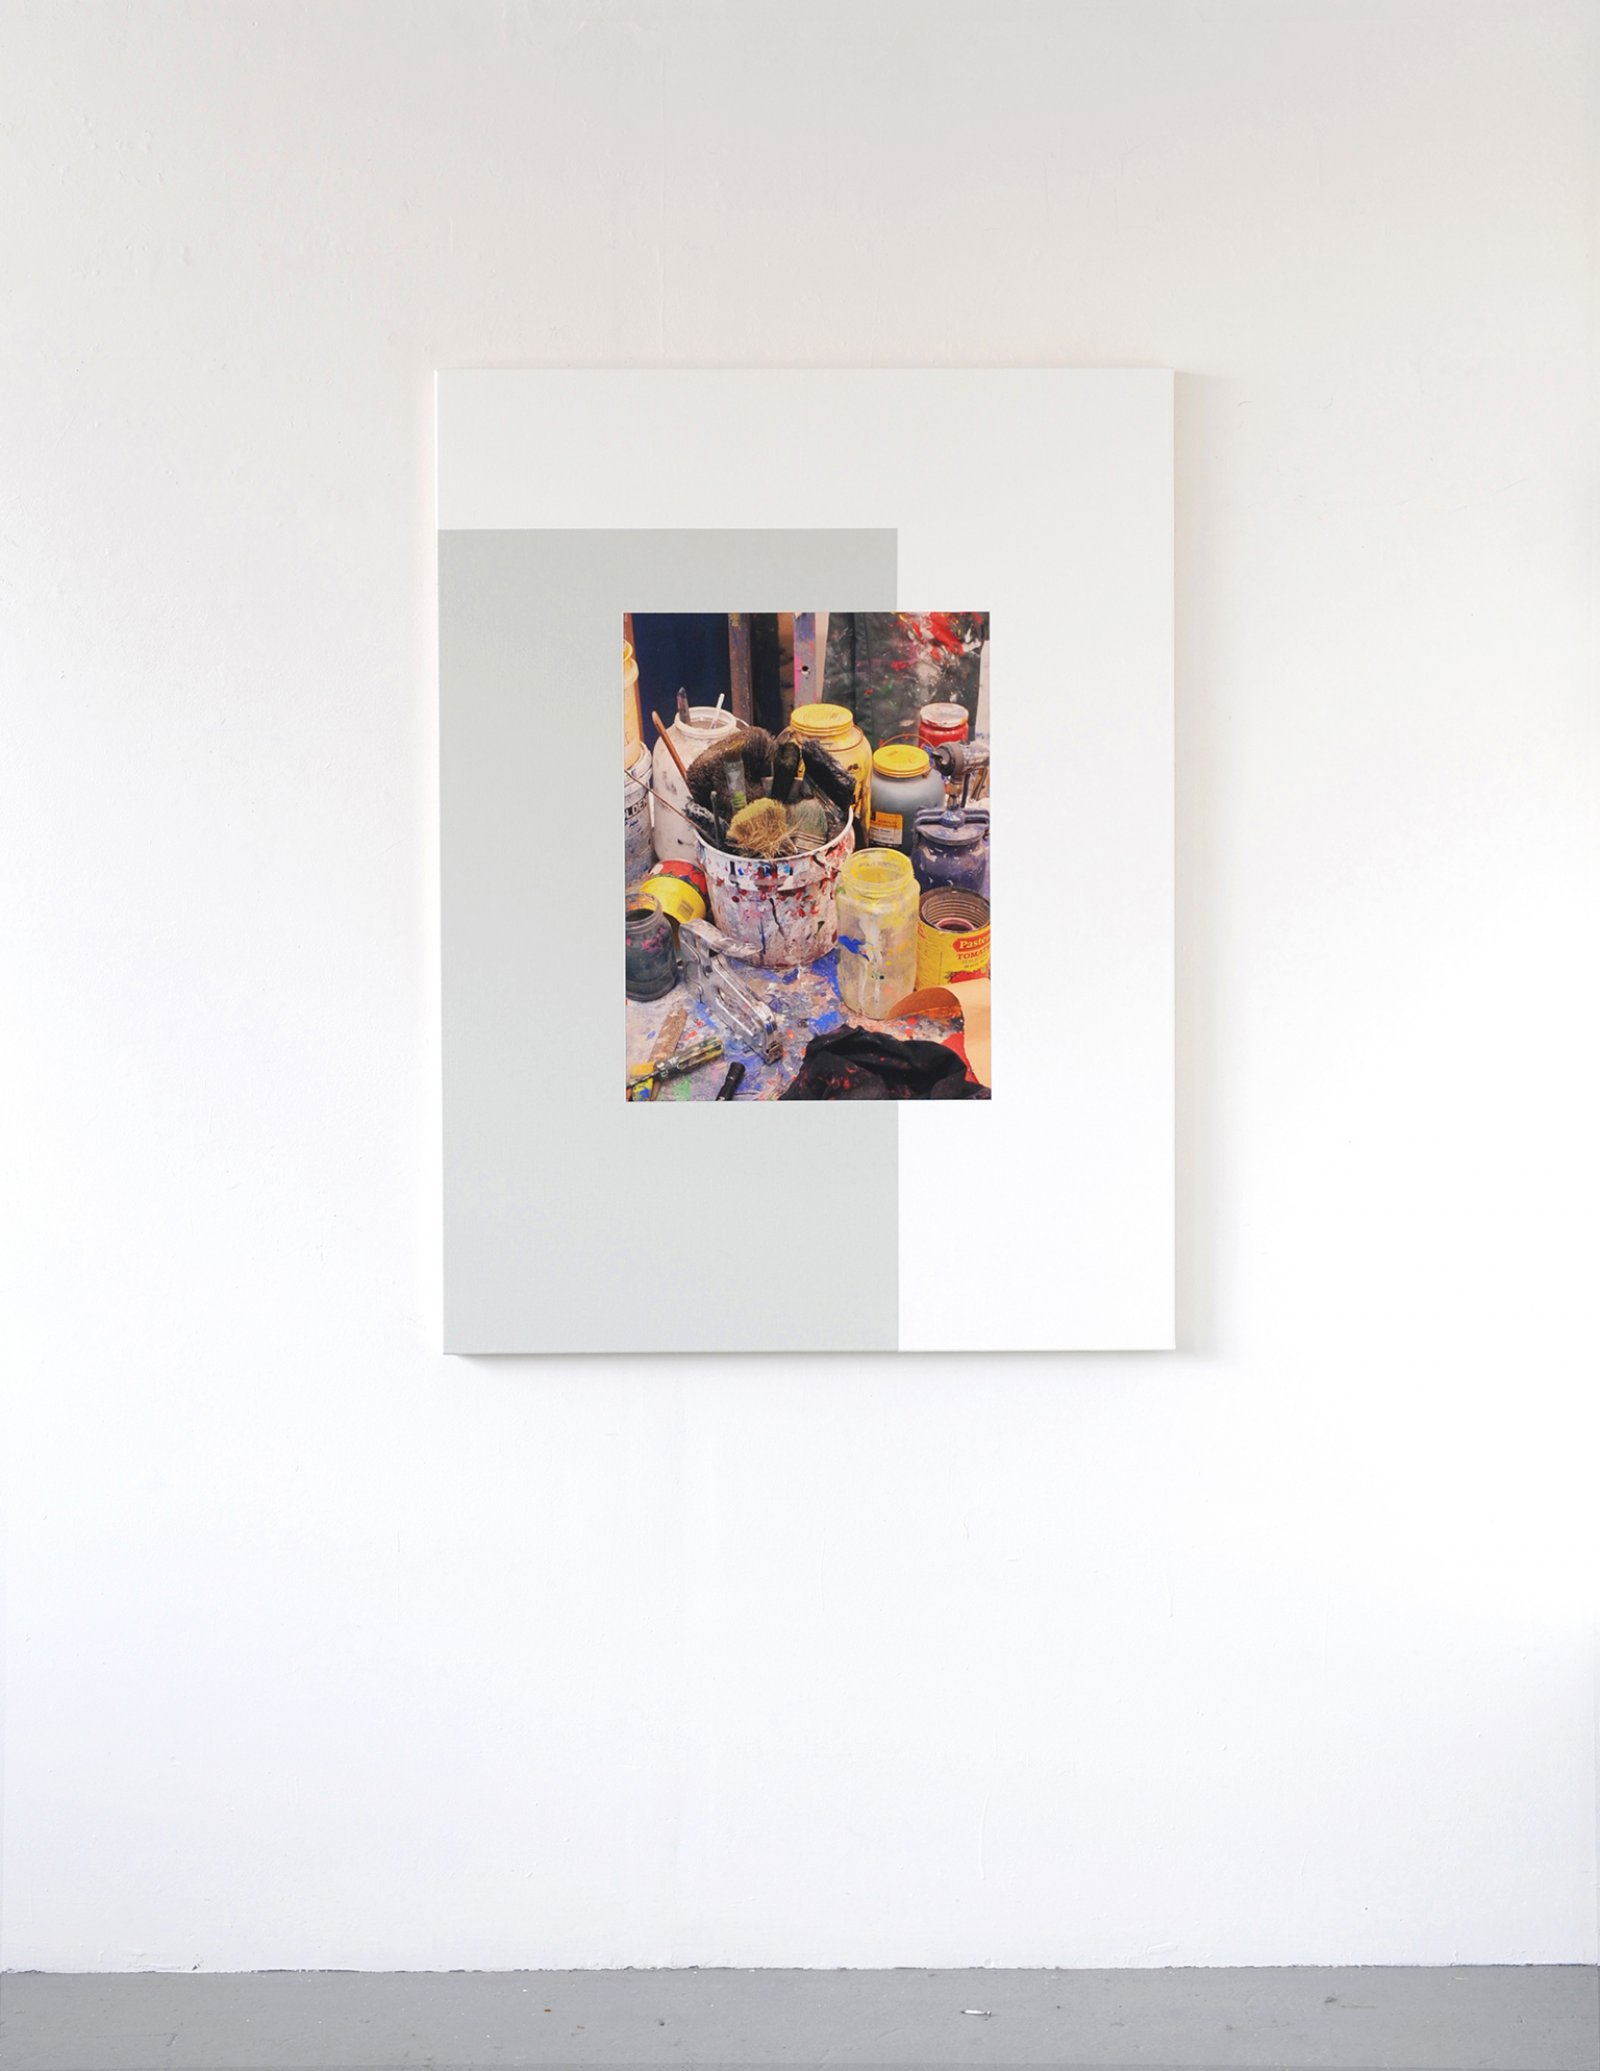 Ian Wallace,Les Traces de la Peinture (Molinari Series) V, 2012,photolaminate and acrylic on canvas, 60 x 48 in. (152 x 122 cm)